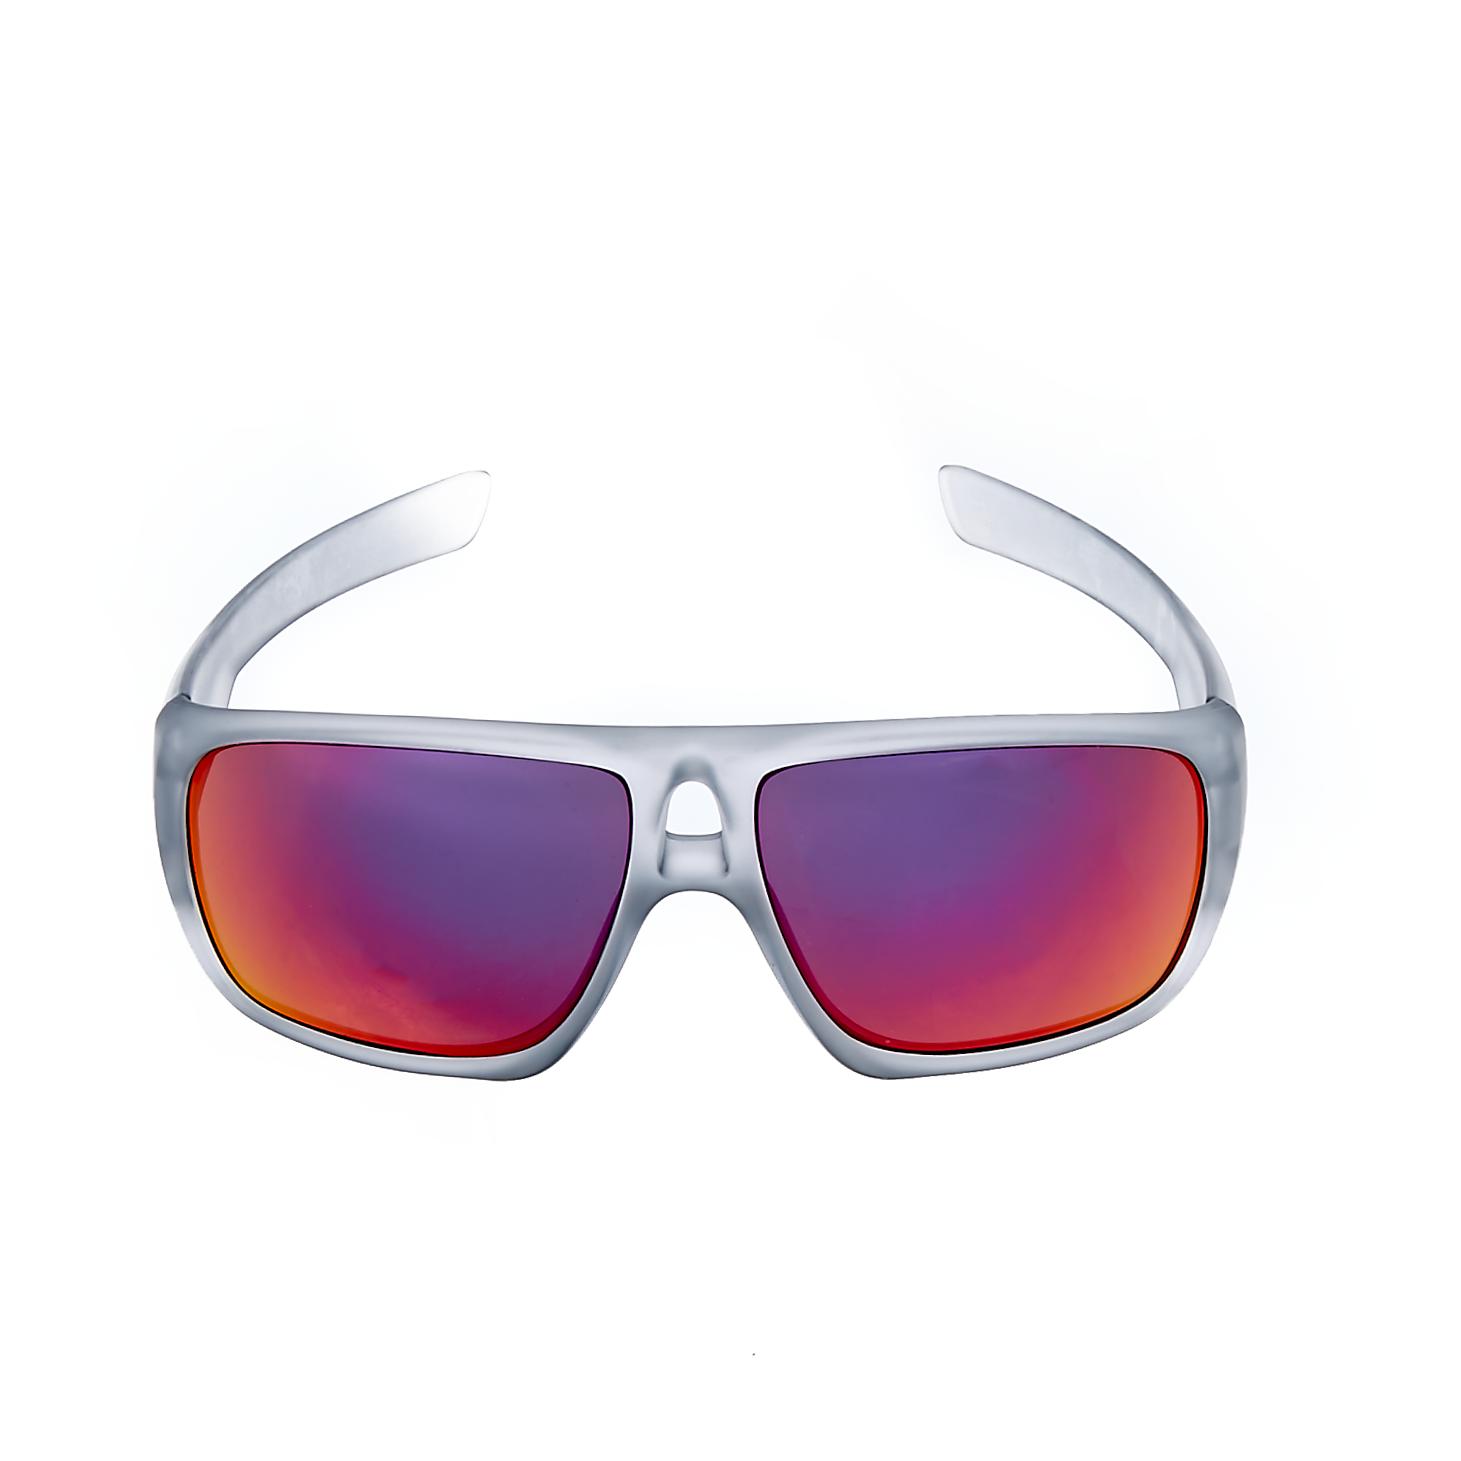 BREO - Γυαλιά ηλίου DOWNHILL ICE διάφανα γυναικεία αξεσουάρ γυαλιά ηλίου